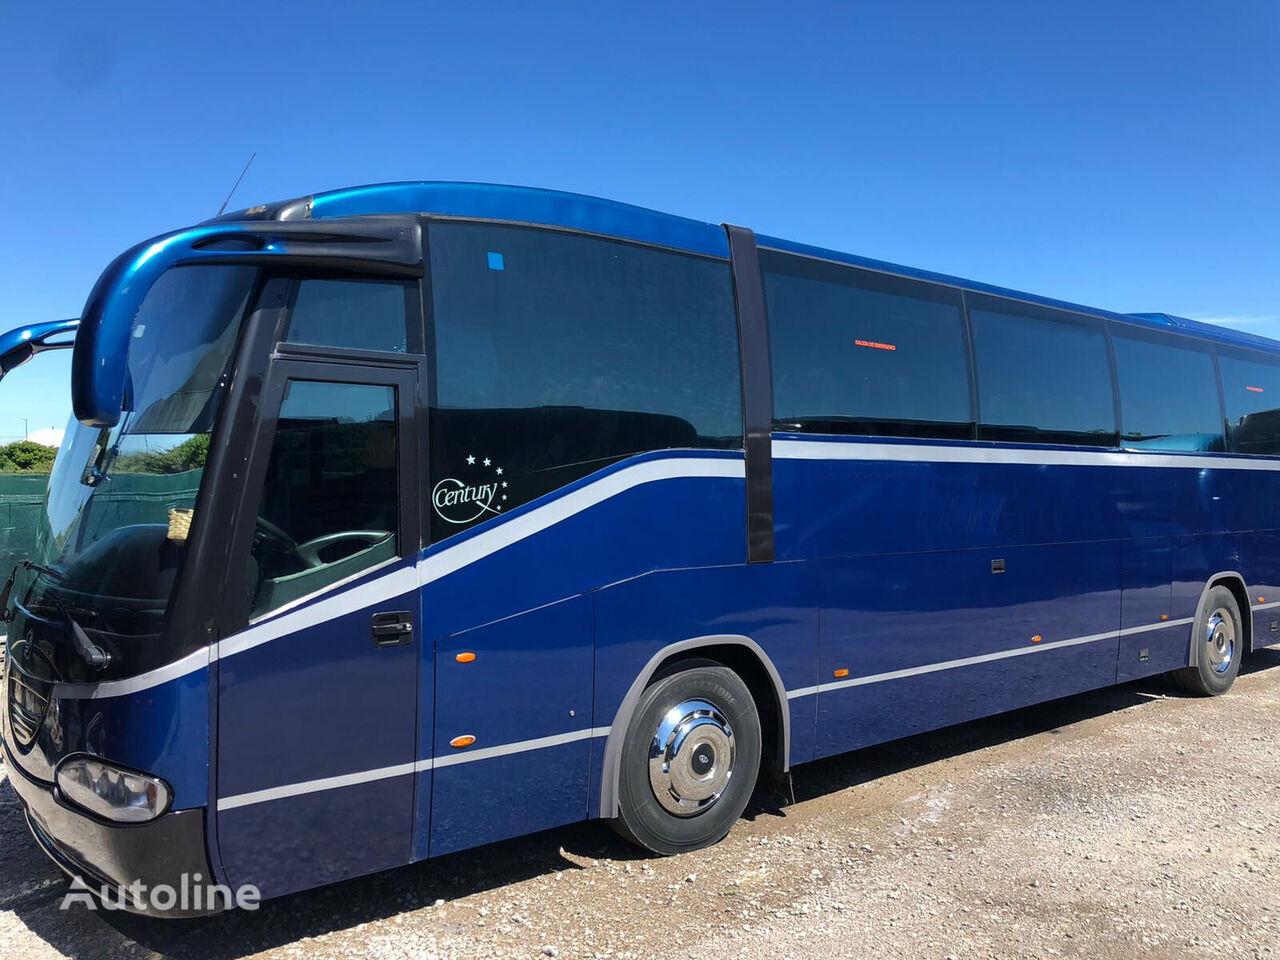 SCANIA IRIZAR CENTURY autobús de turismo